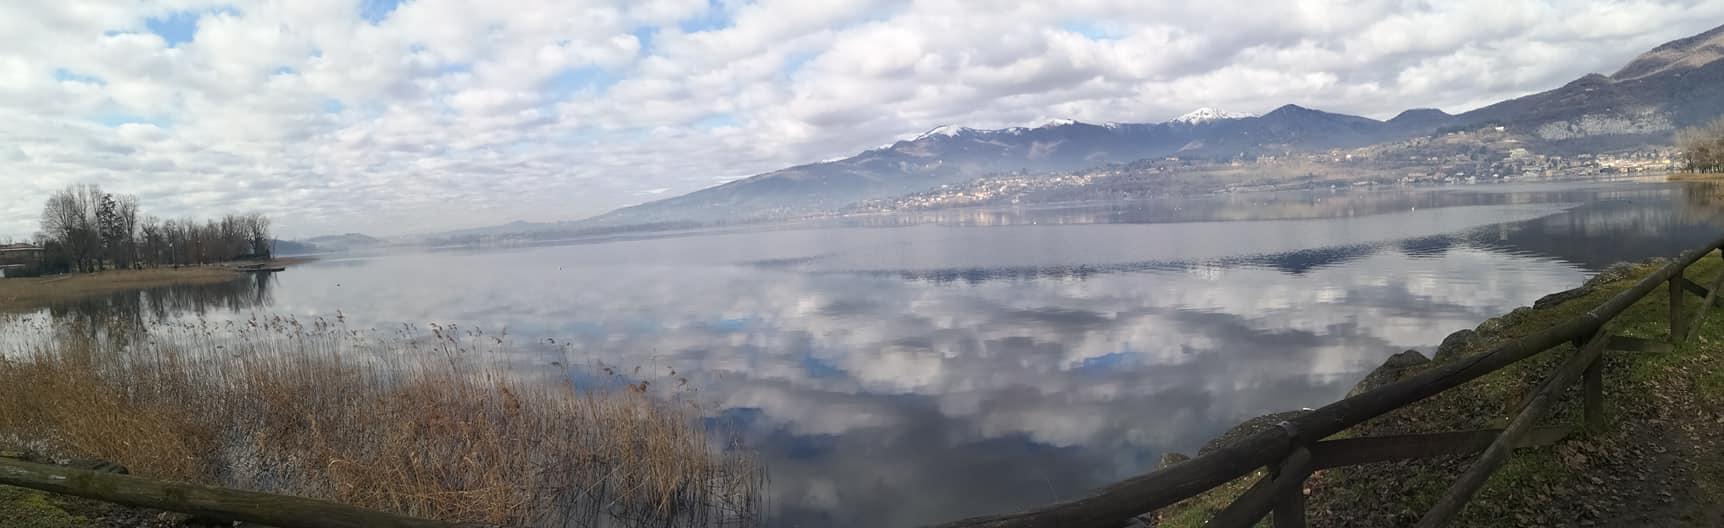 Fra Terra, Cielo, Nuvole, Lago e Montagne... Haola!